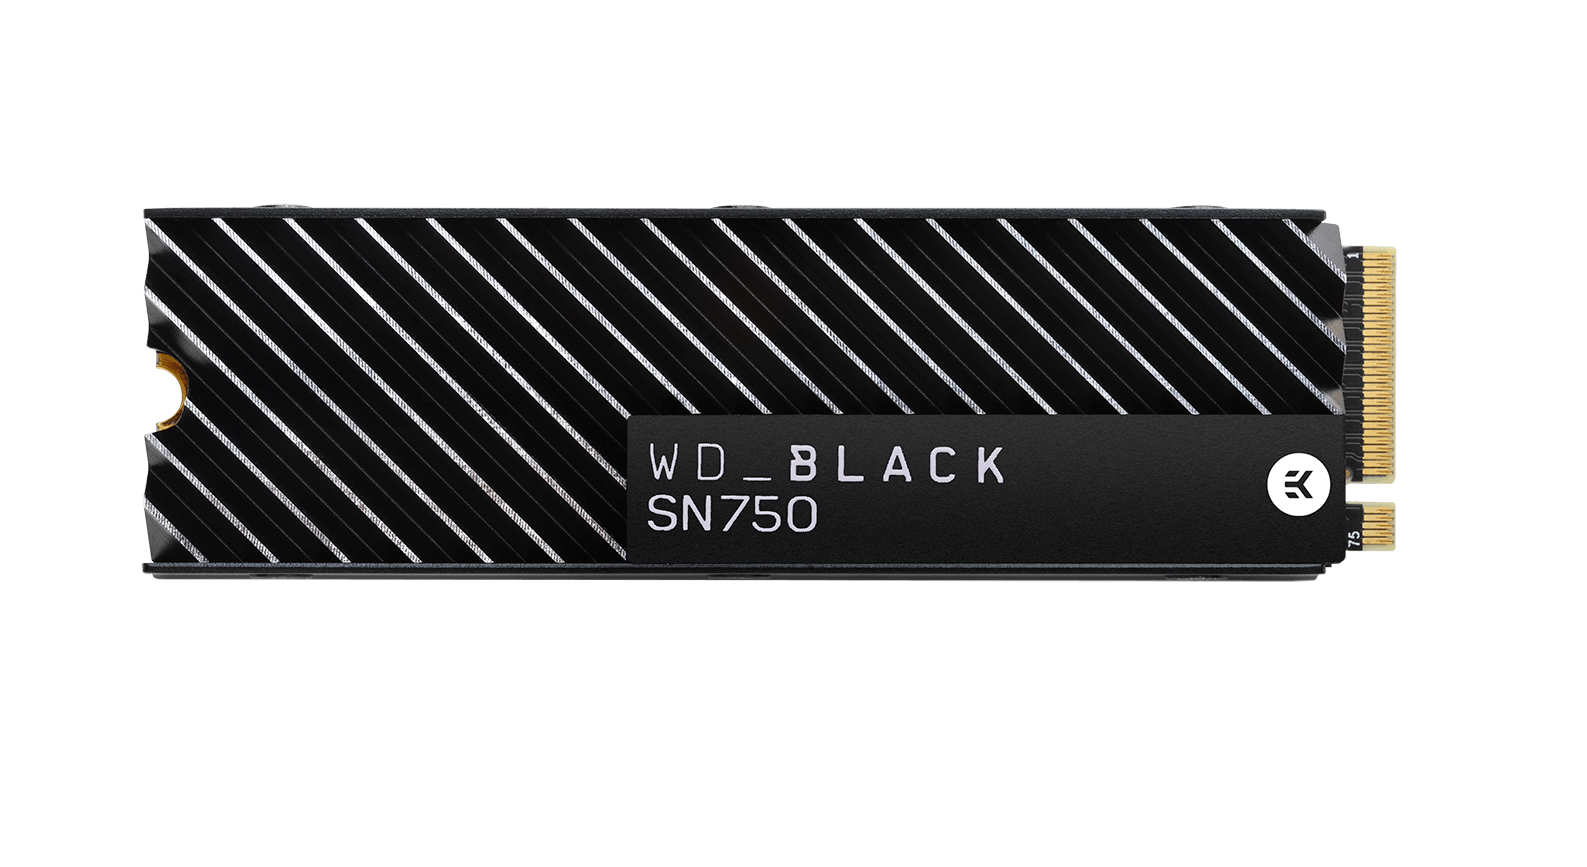 NVME SSDs Heatsink Coolers